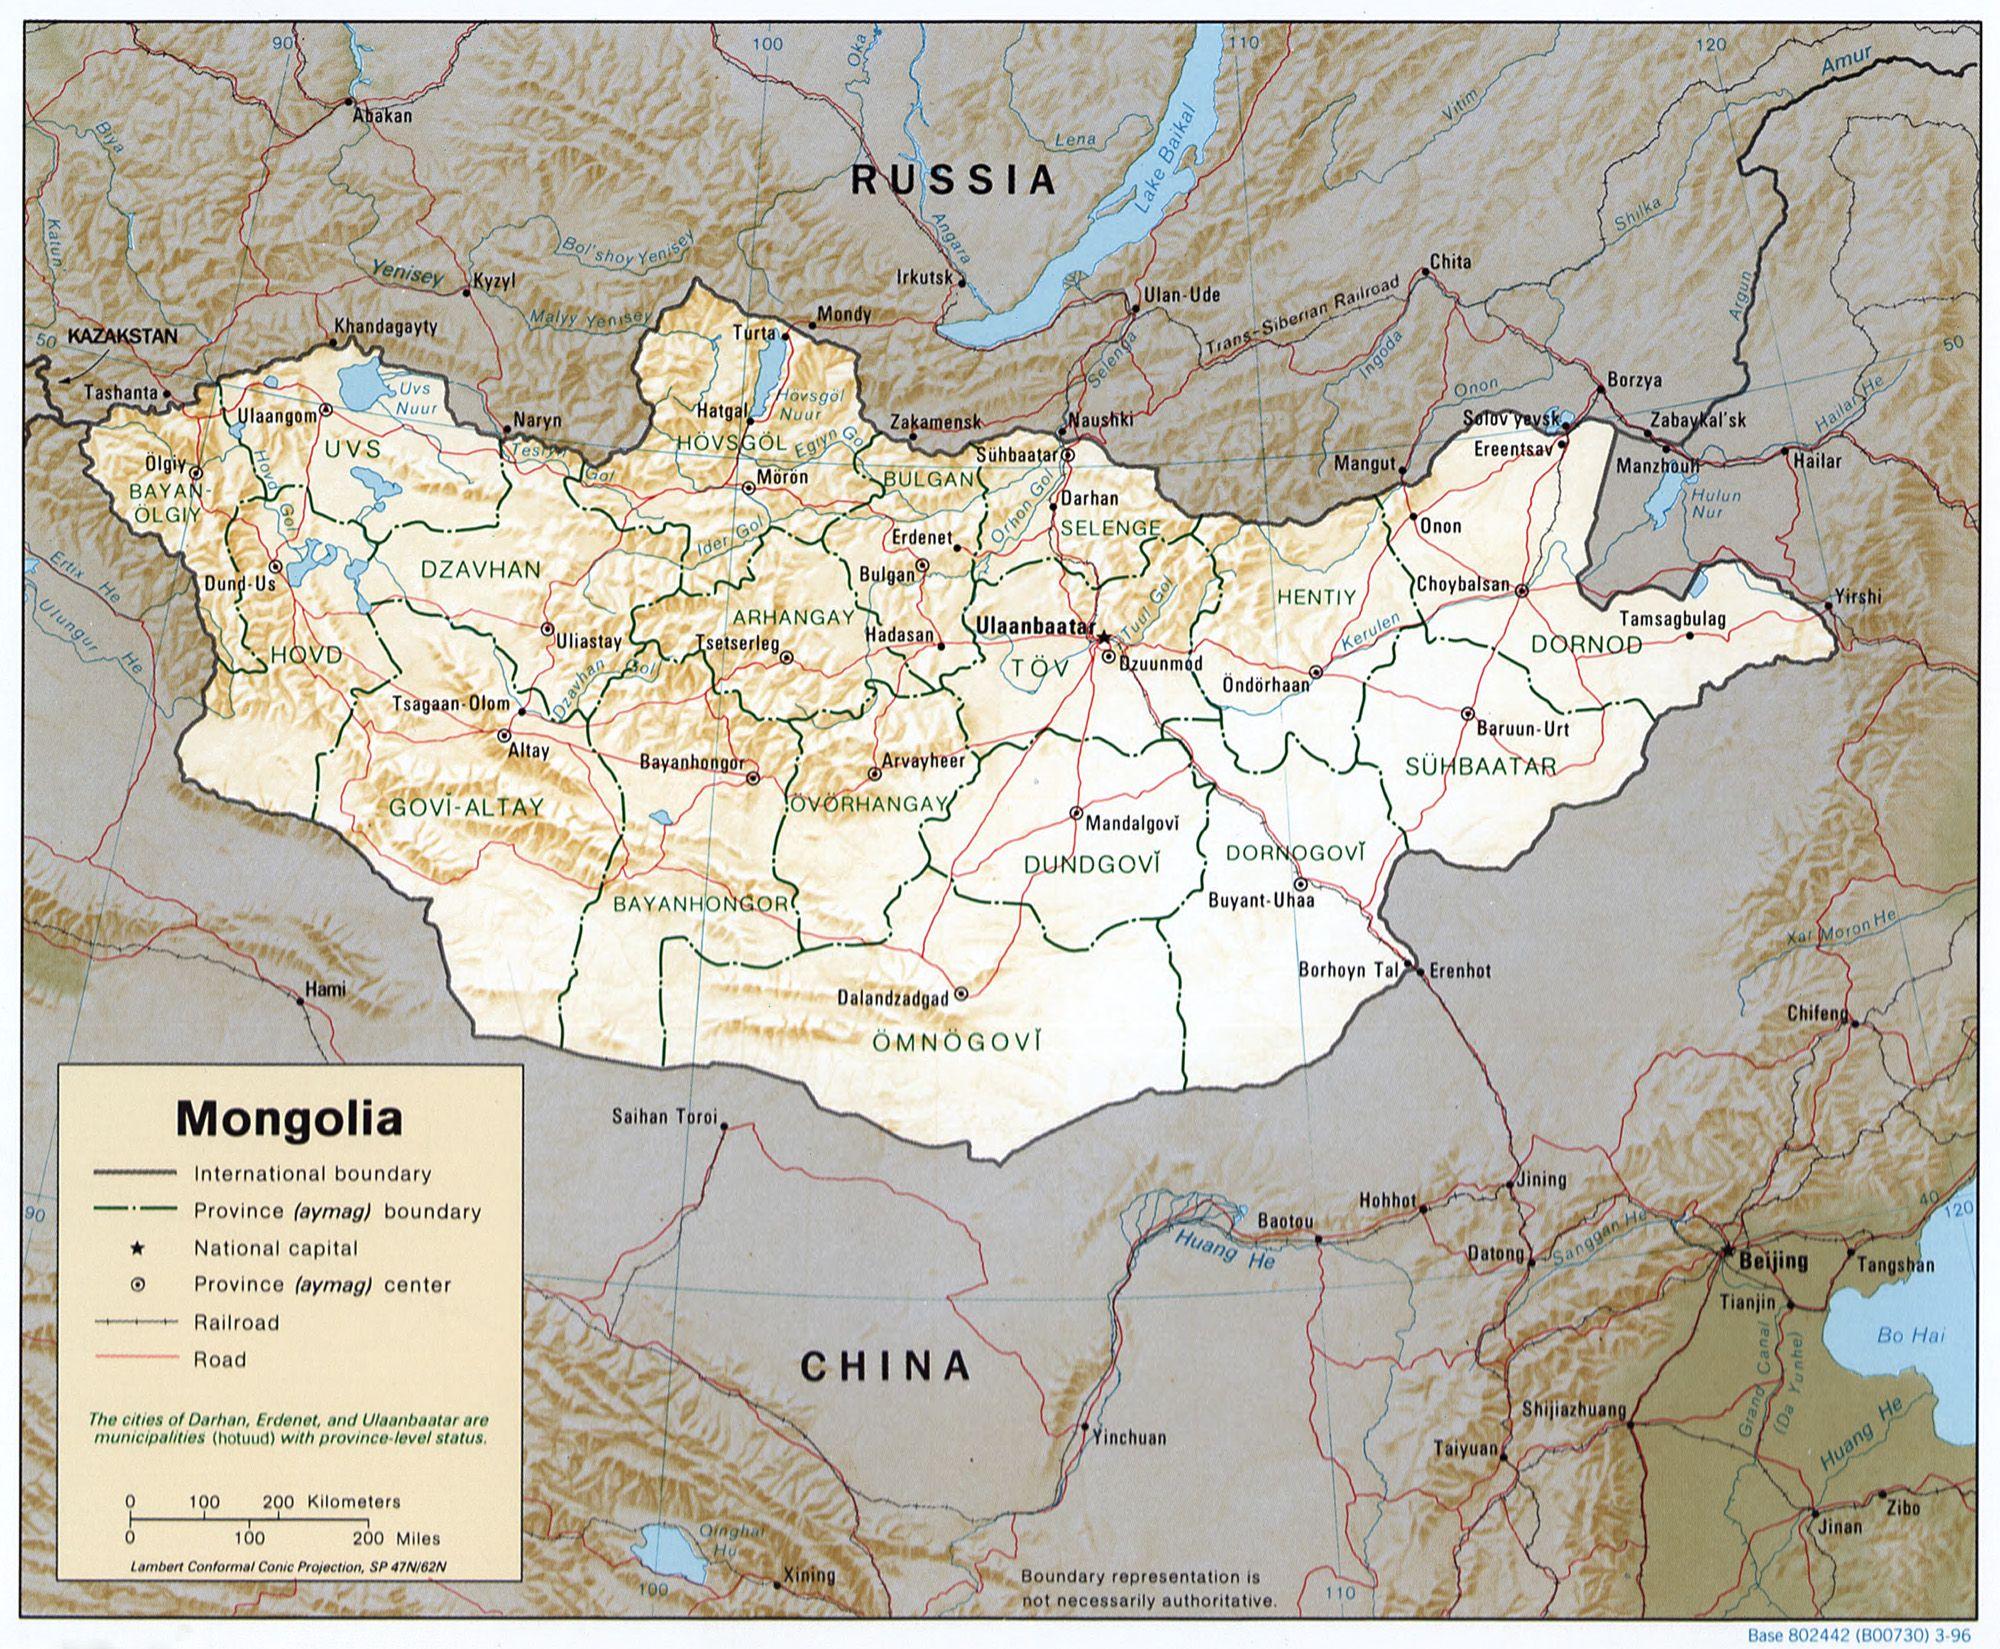 Map Of Asia Gobi Desert.The Southern Portion Of Mongolia Is Taken Up By The Gobi Desert